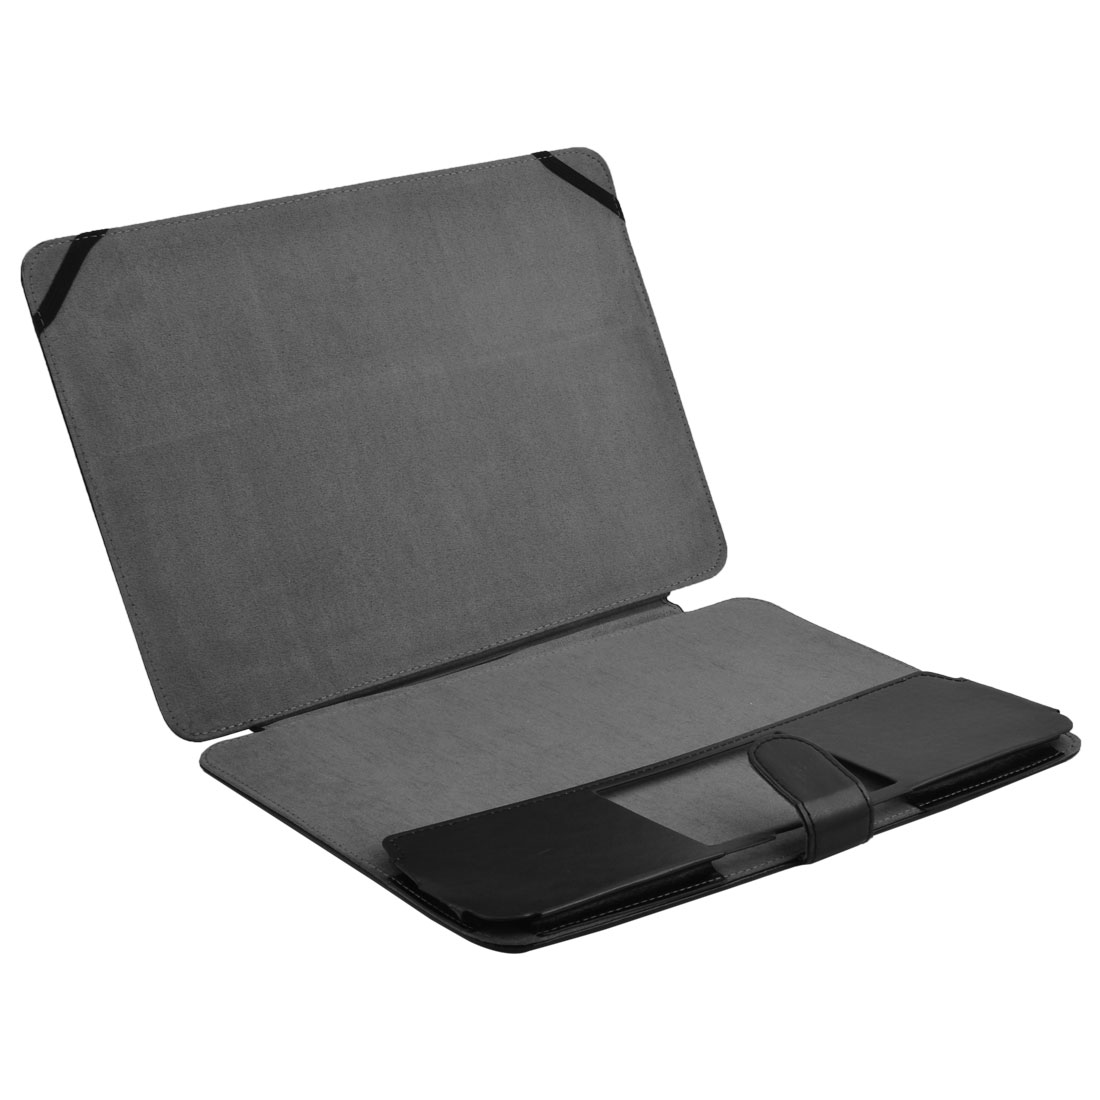 Laptop PU Leather Folio Sleeve Bag Filp Skin Case Black for MacBook Pro 13.3 Inch